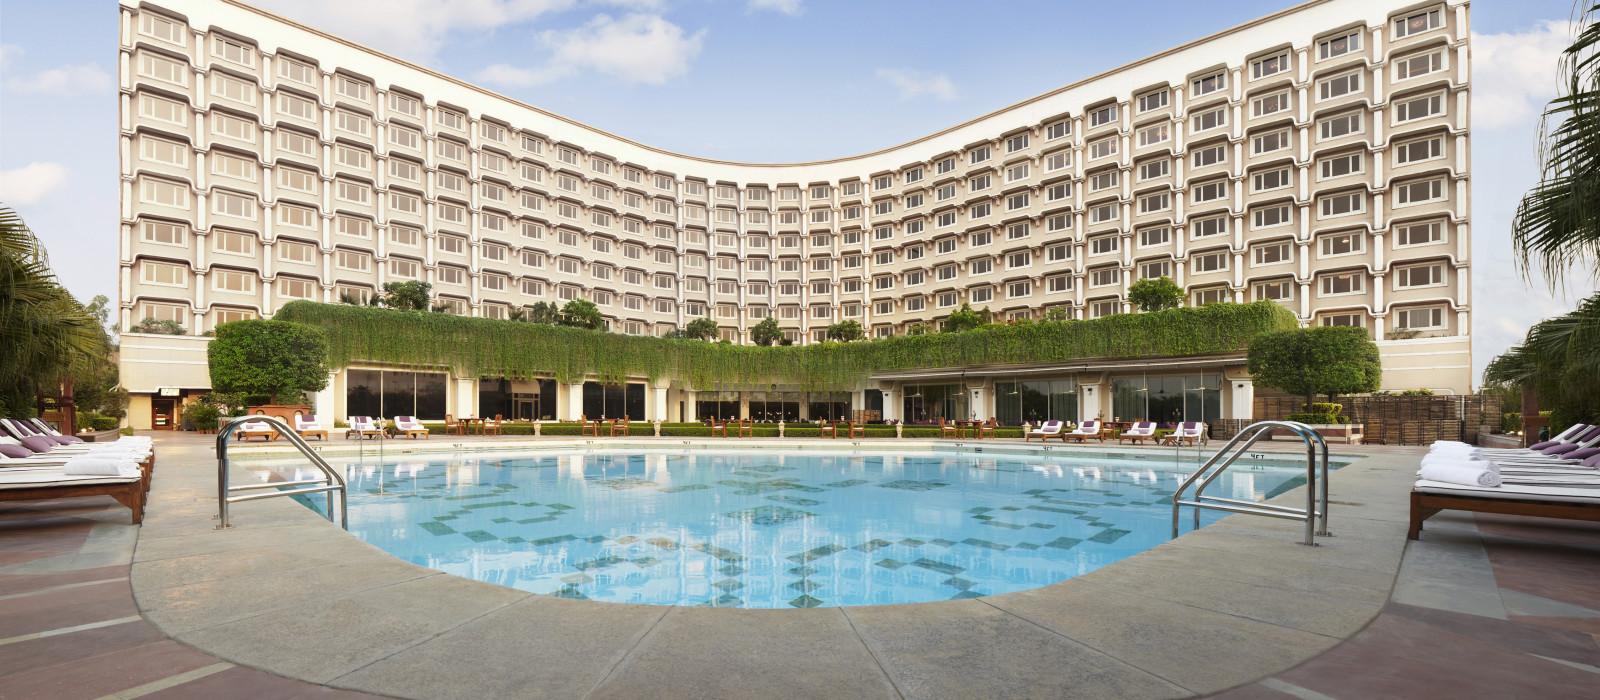 Hotel Taj Palace, New Delhi Nordindien